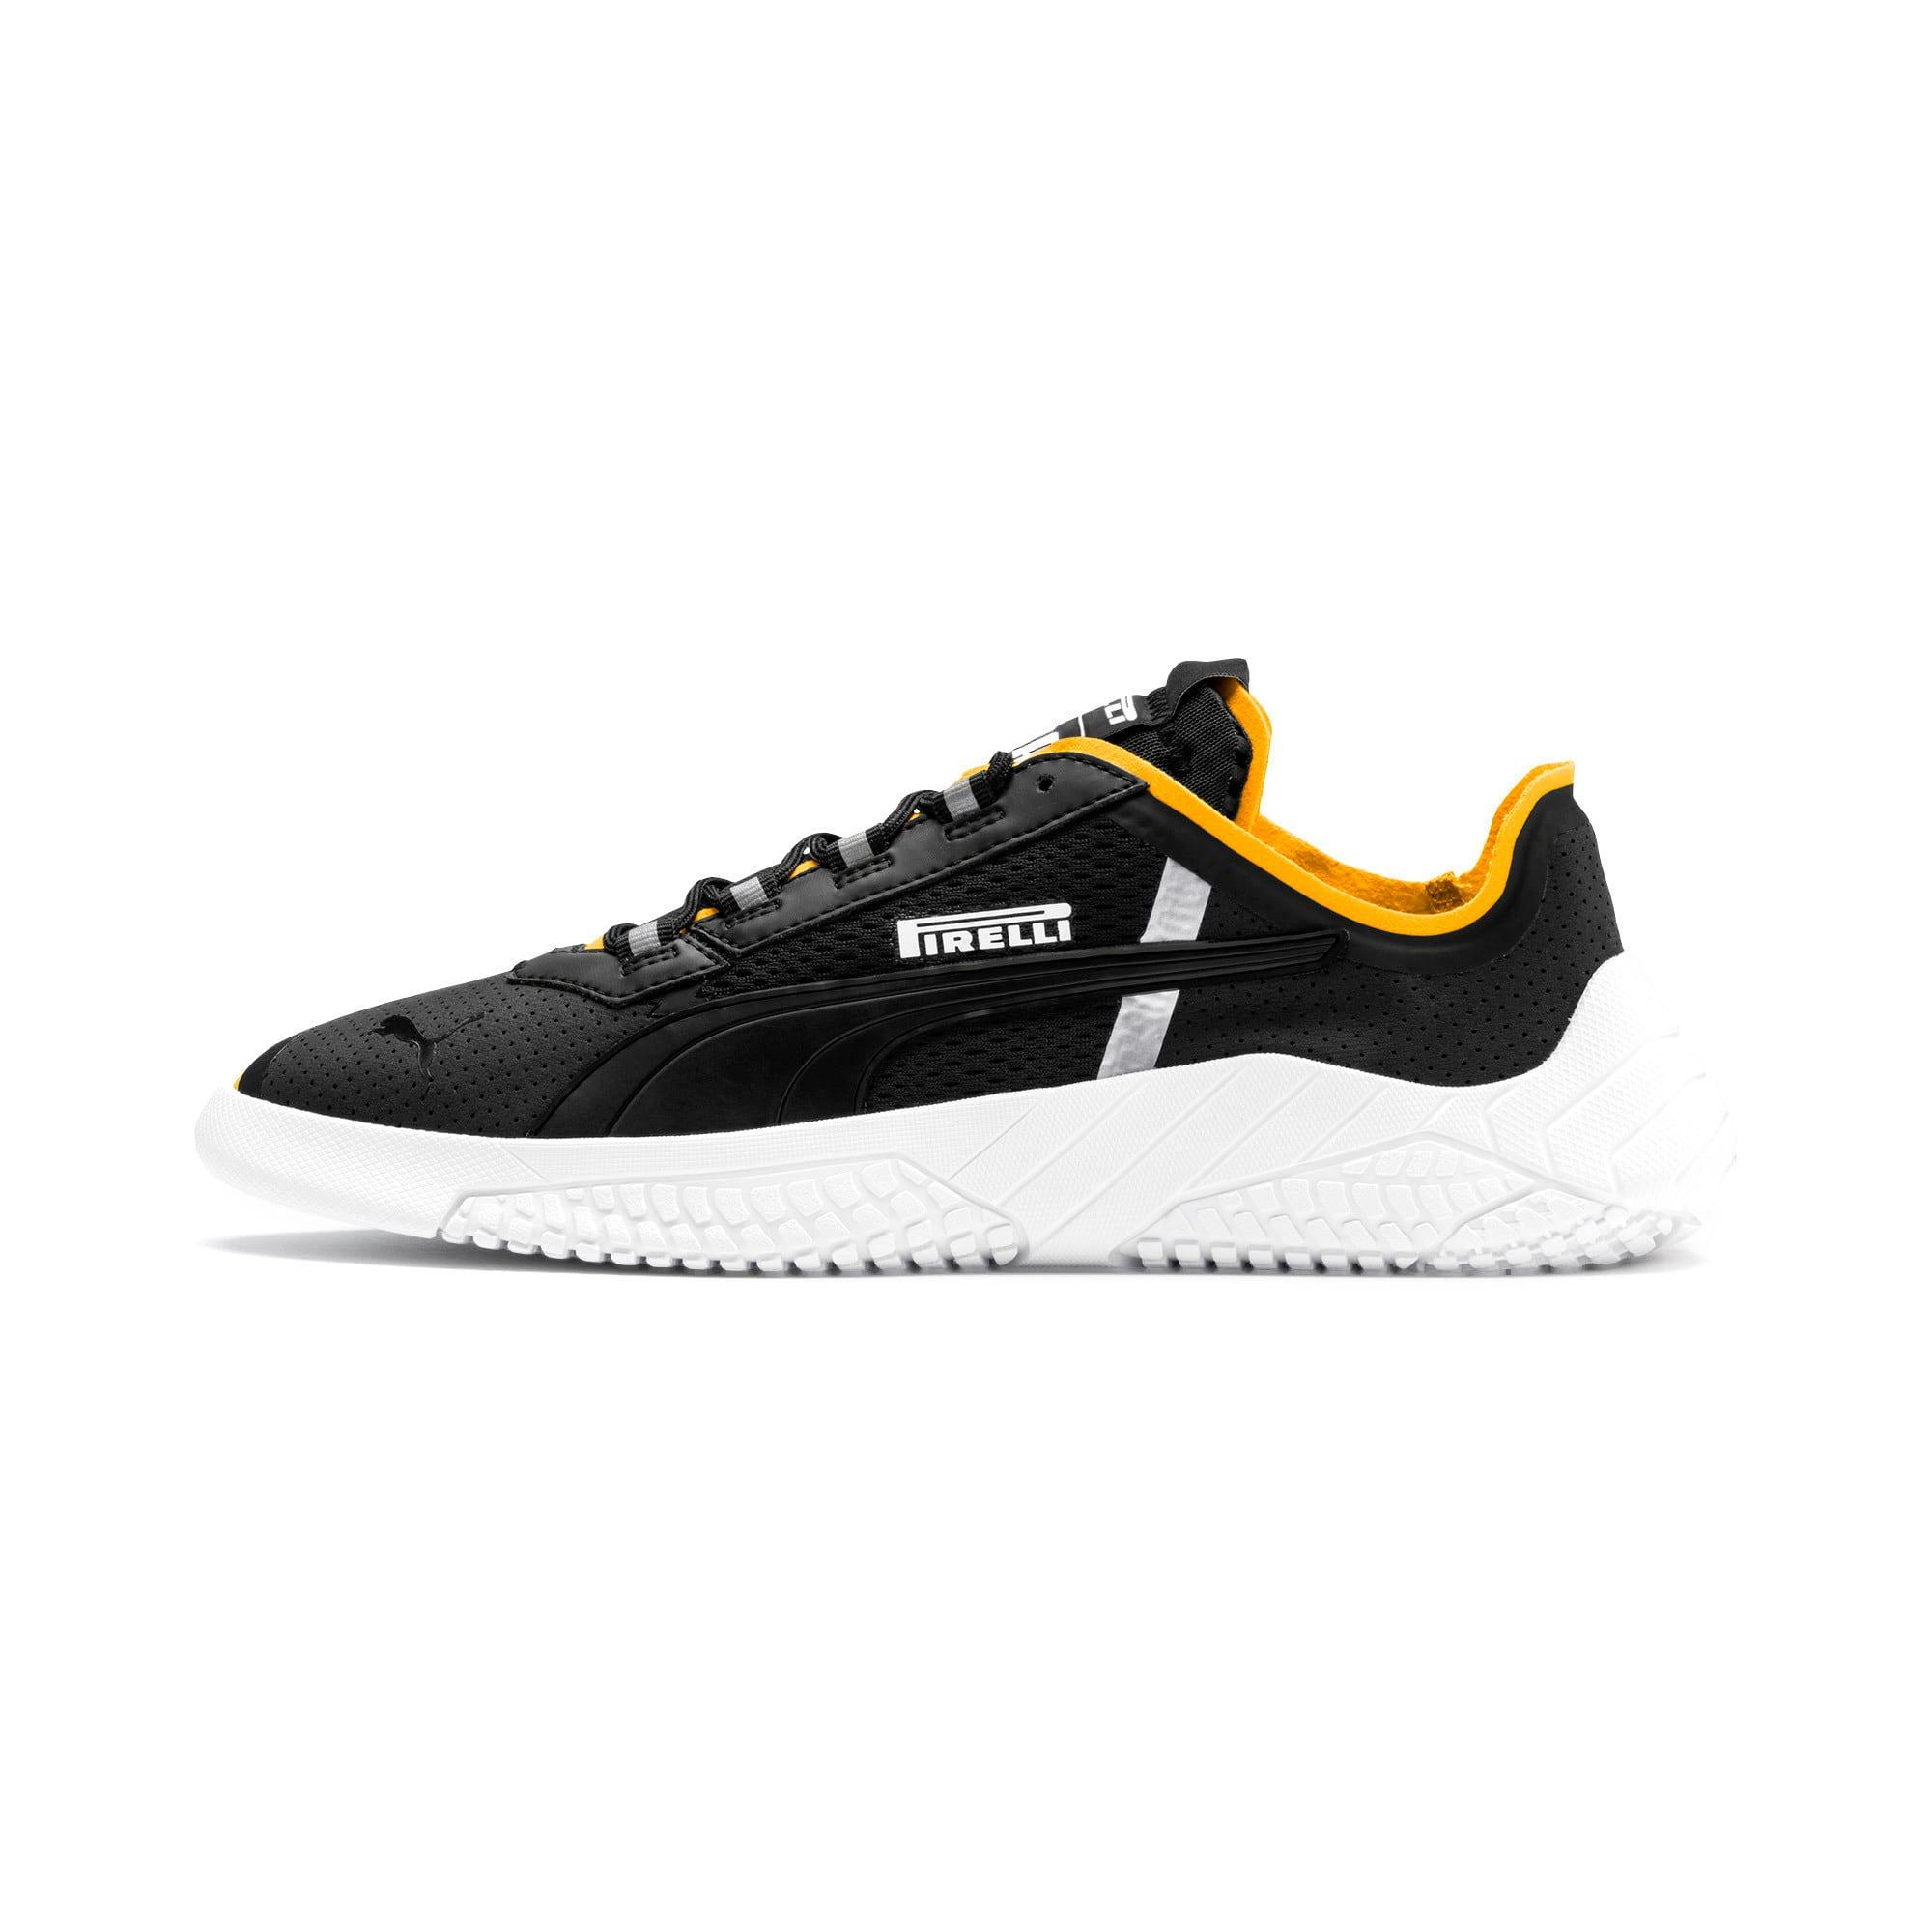 Thumbnail 1 of Replicat-X Pirelli Motorsport Shoes, Puma Black-Puma White-Zinnia, medium